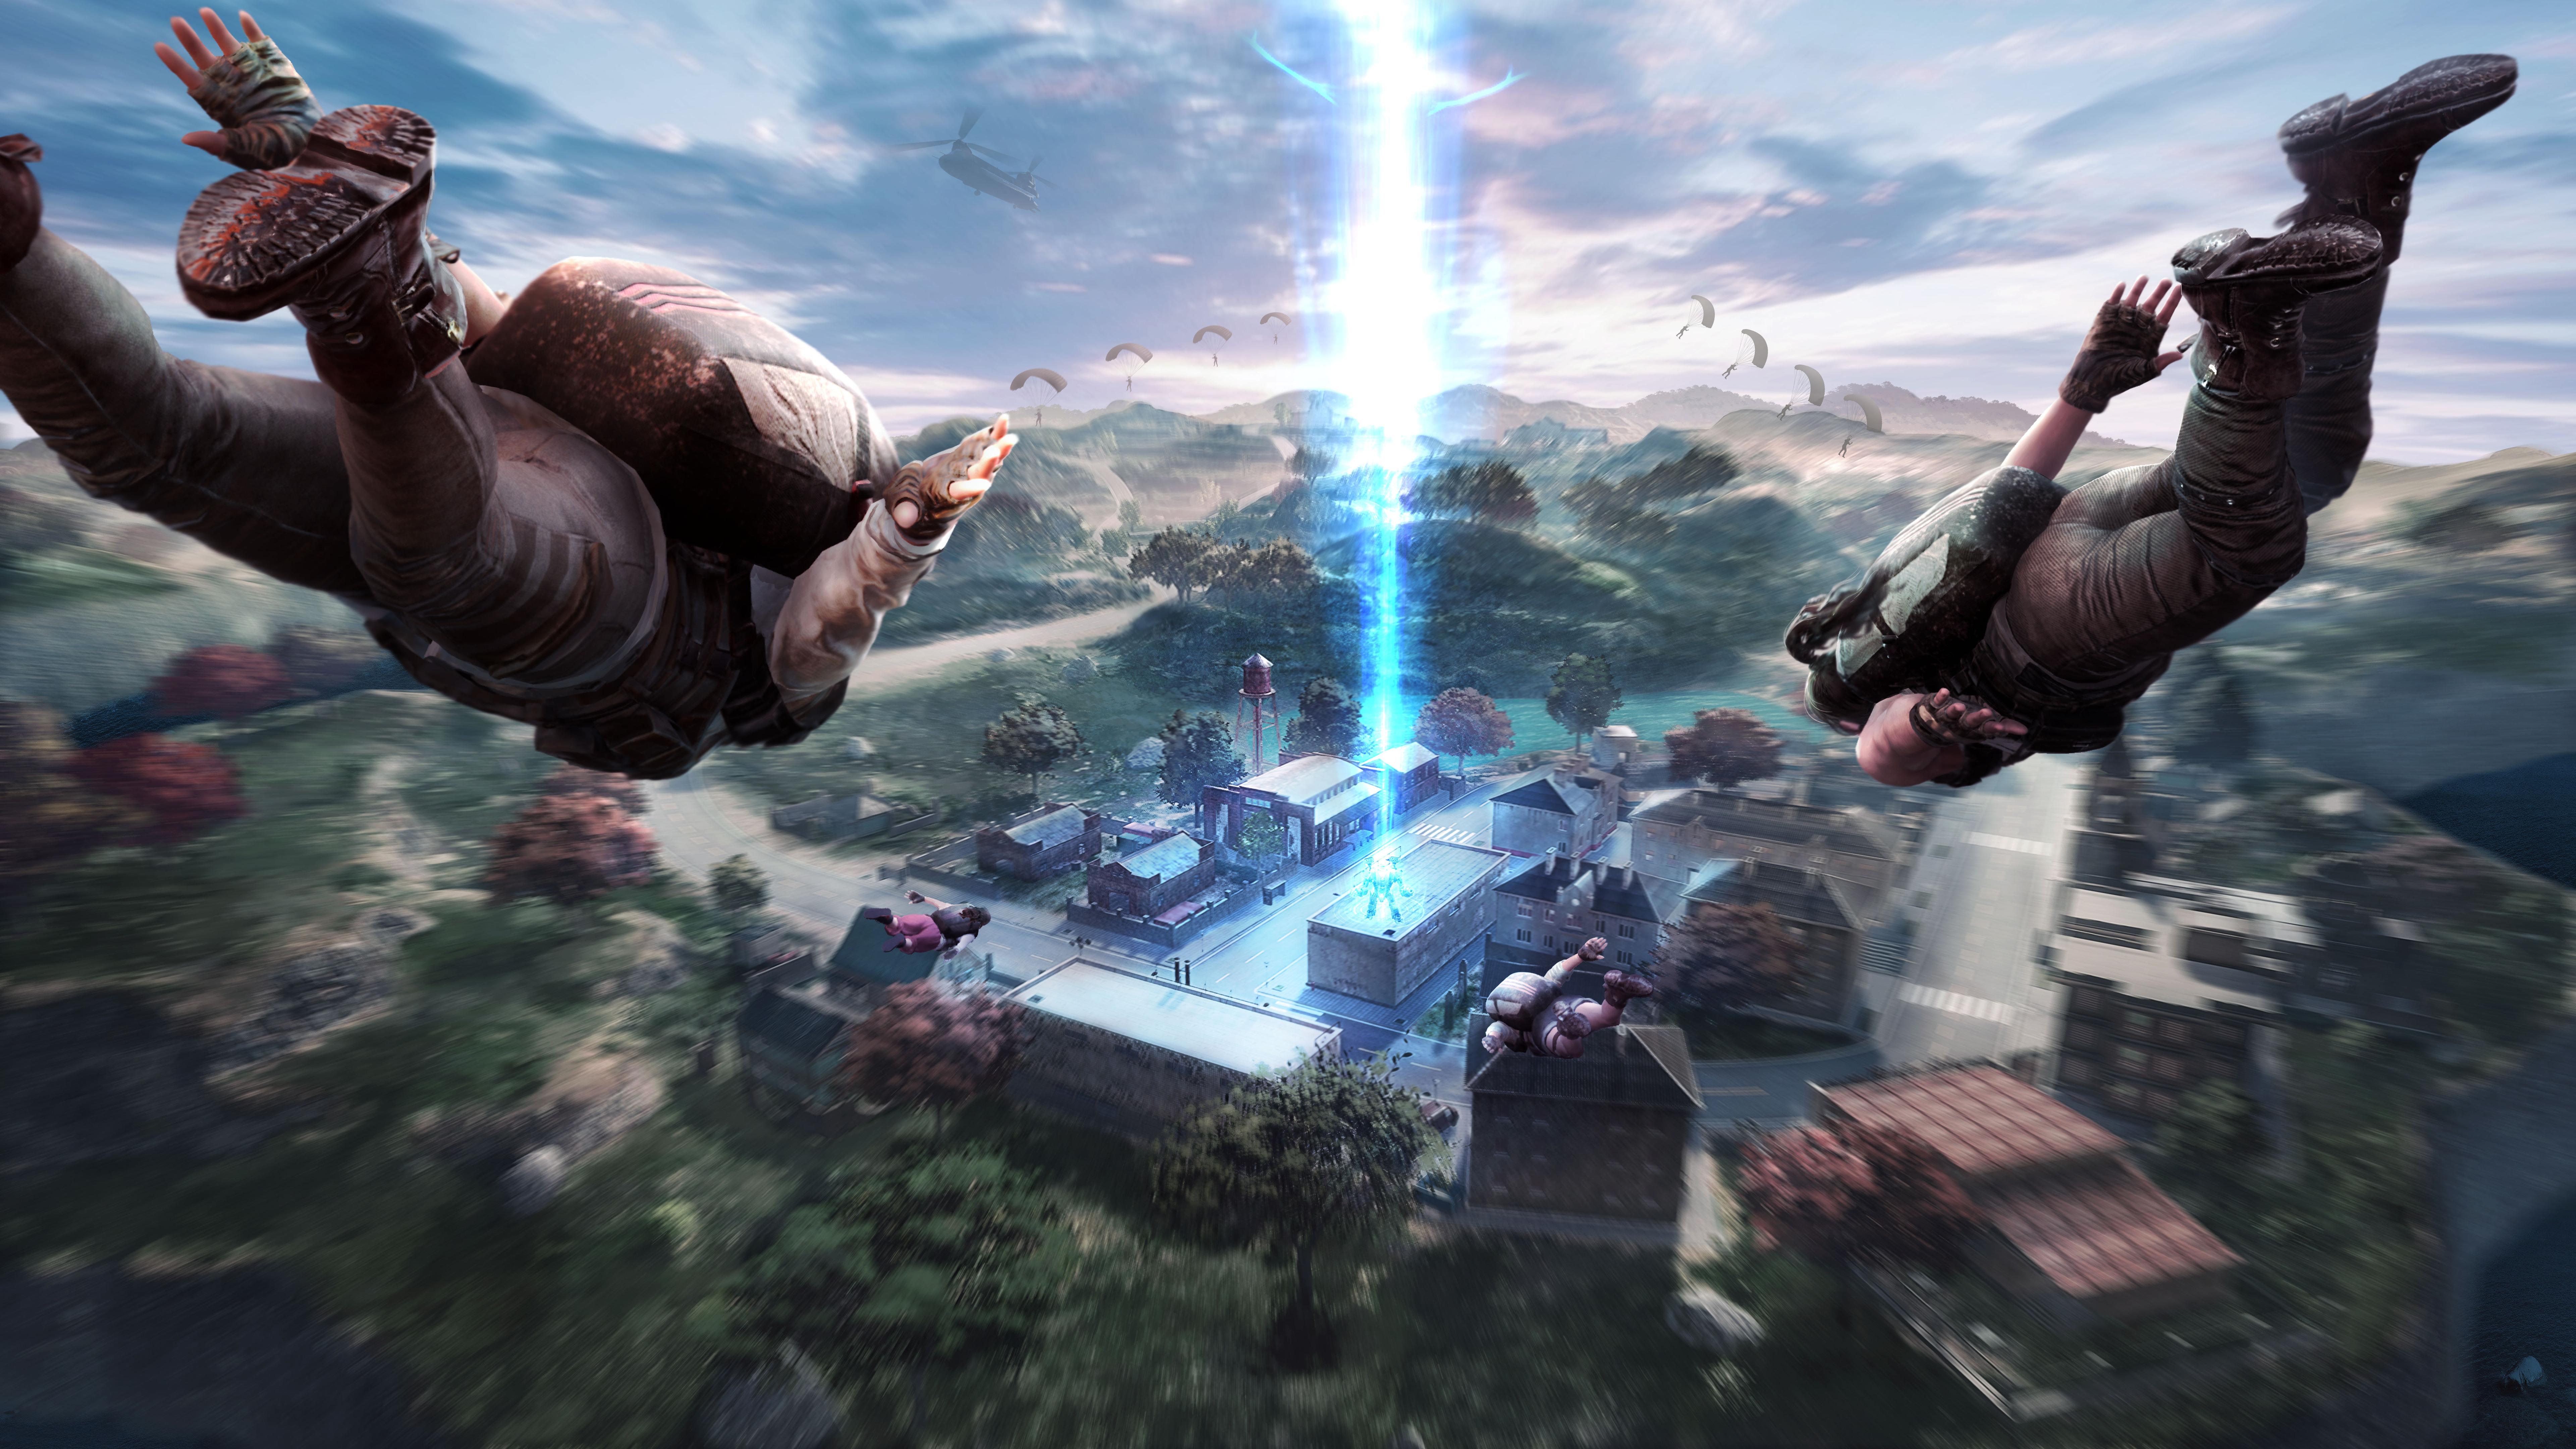 playerunknowns battlegrounds high resolution pubg background hd